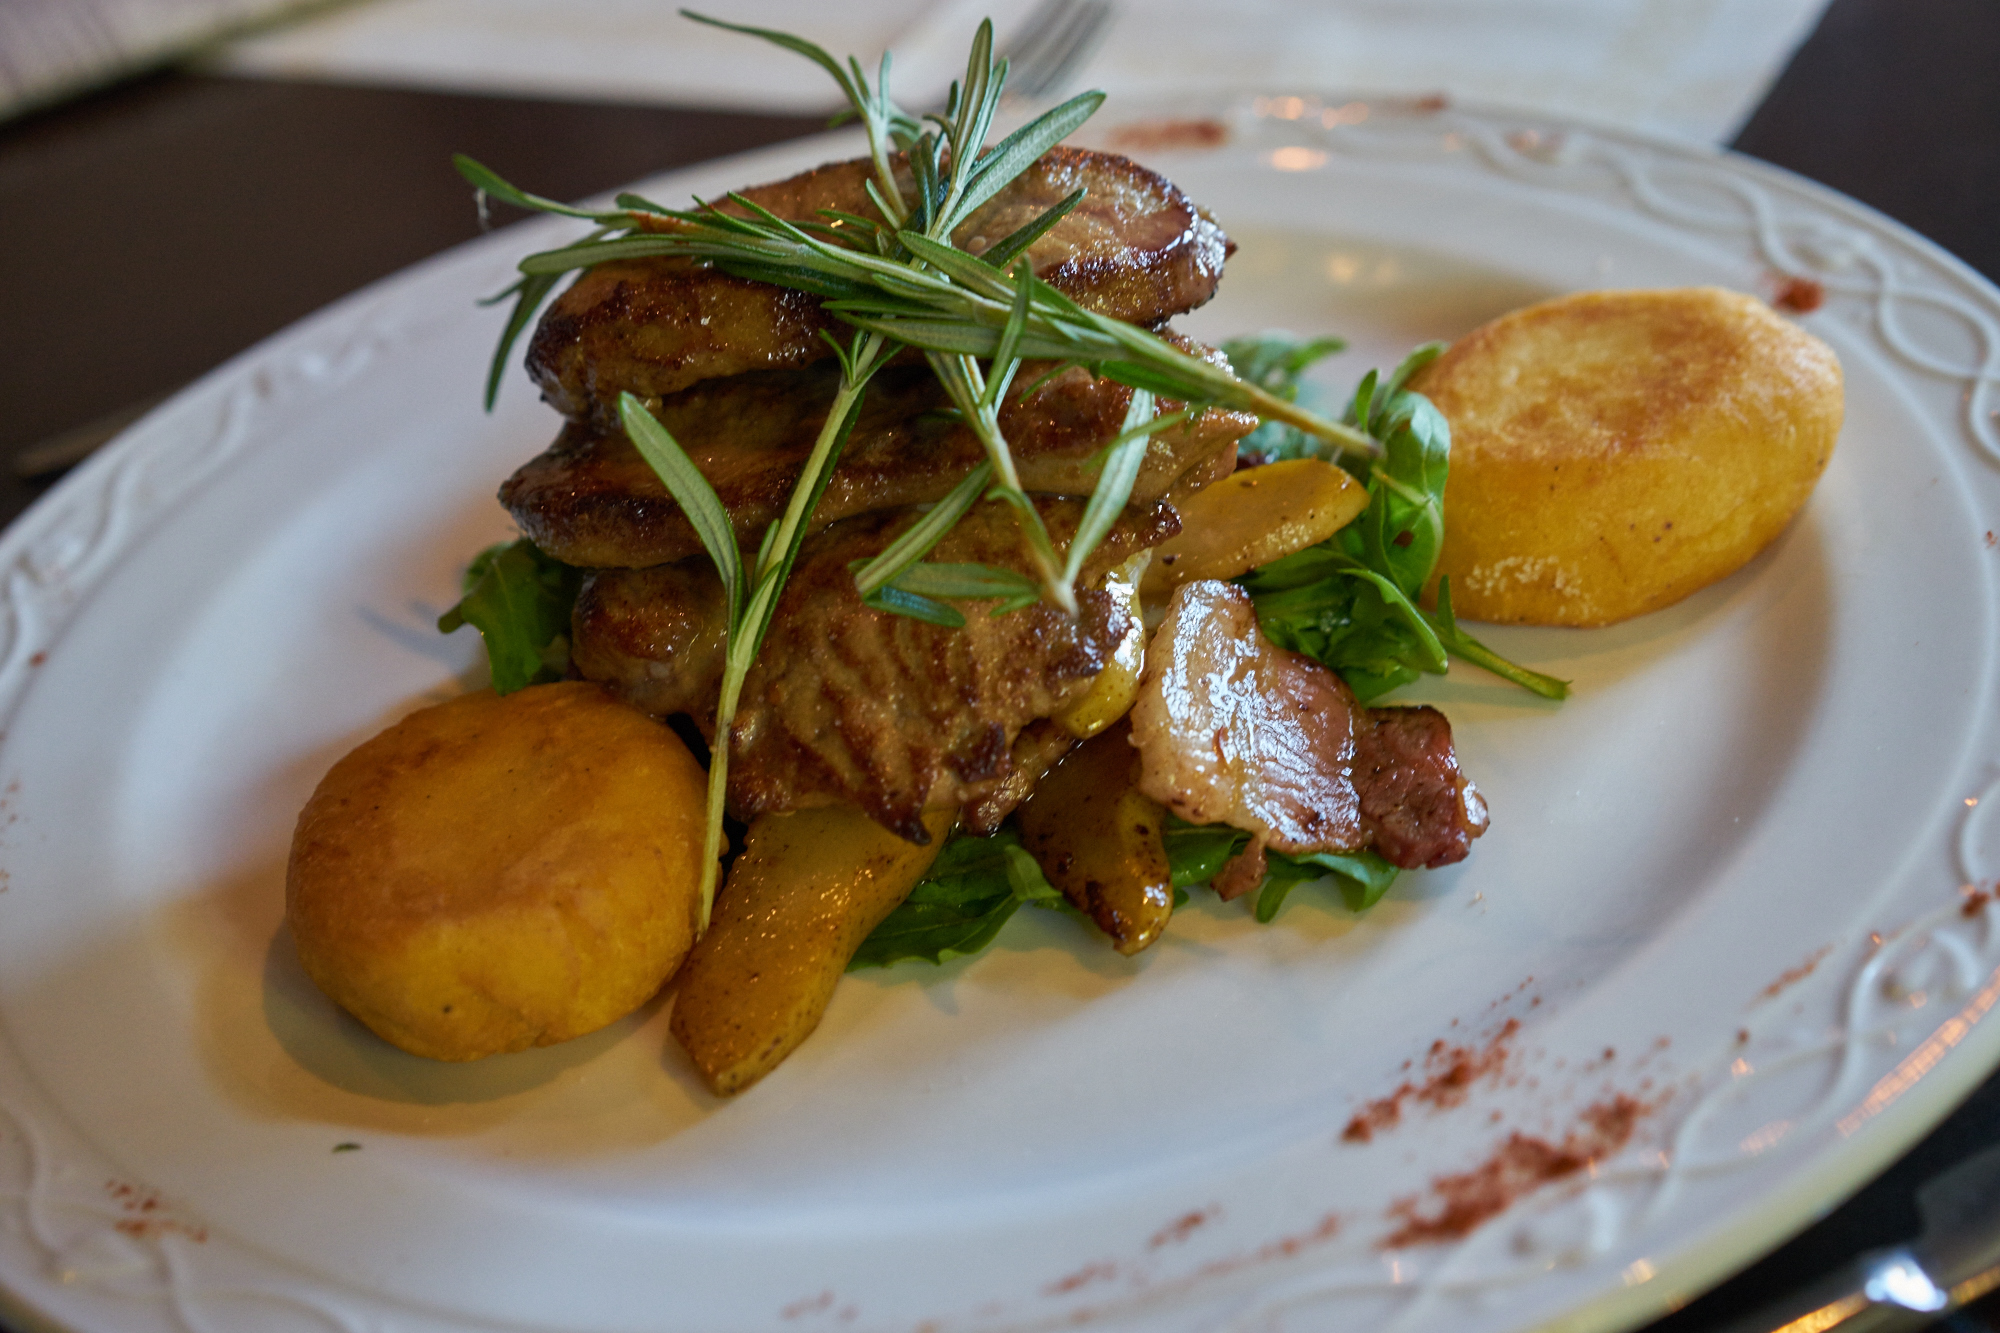 Restaurant Troisdorf - Kalbsleber im Herbst